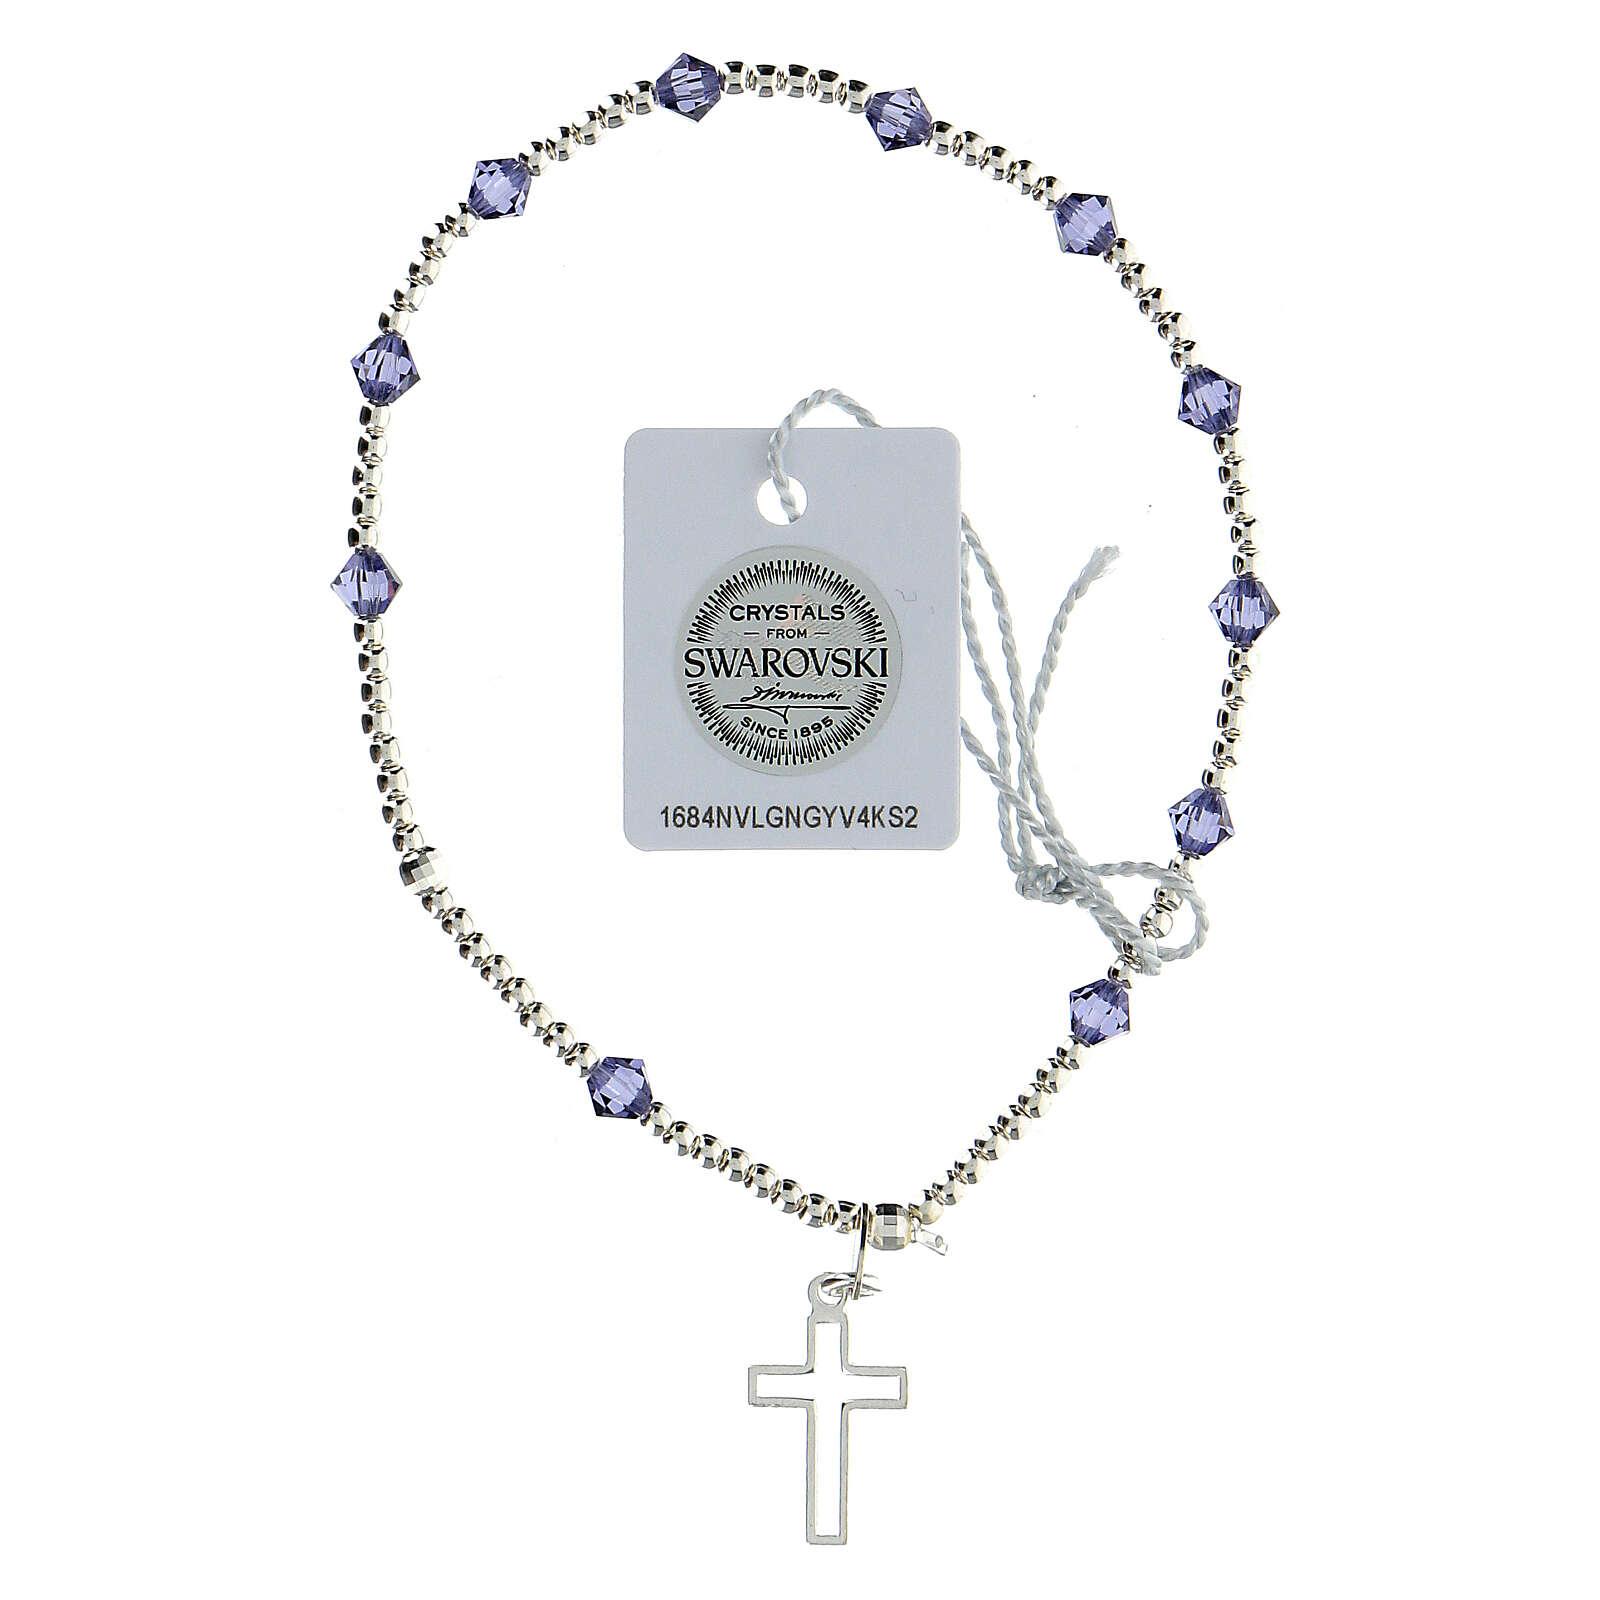 Bracciale cristalli Swarovski viola 4 mm croce traforata argento 925 4